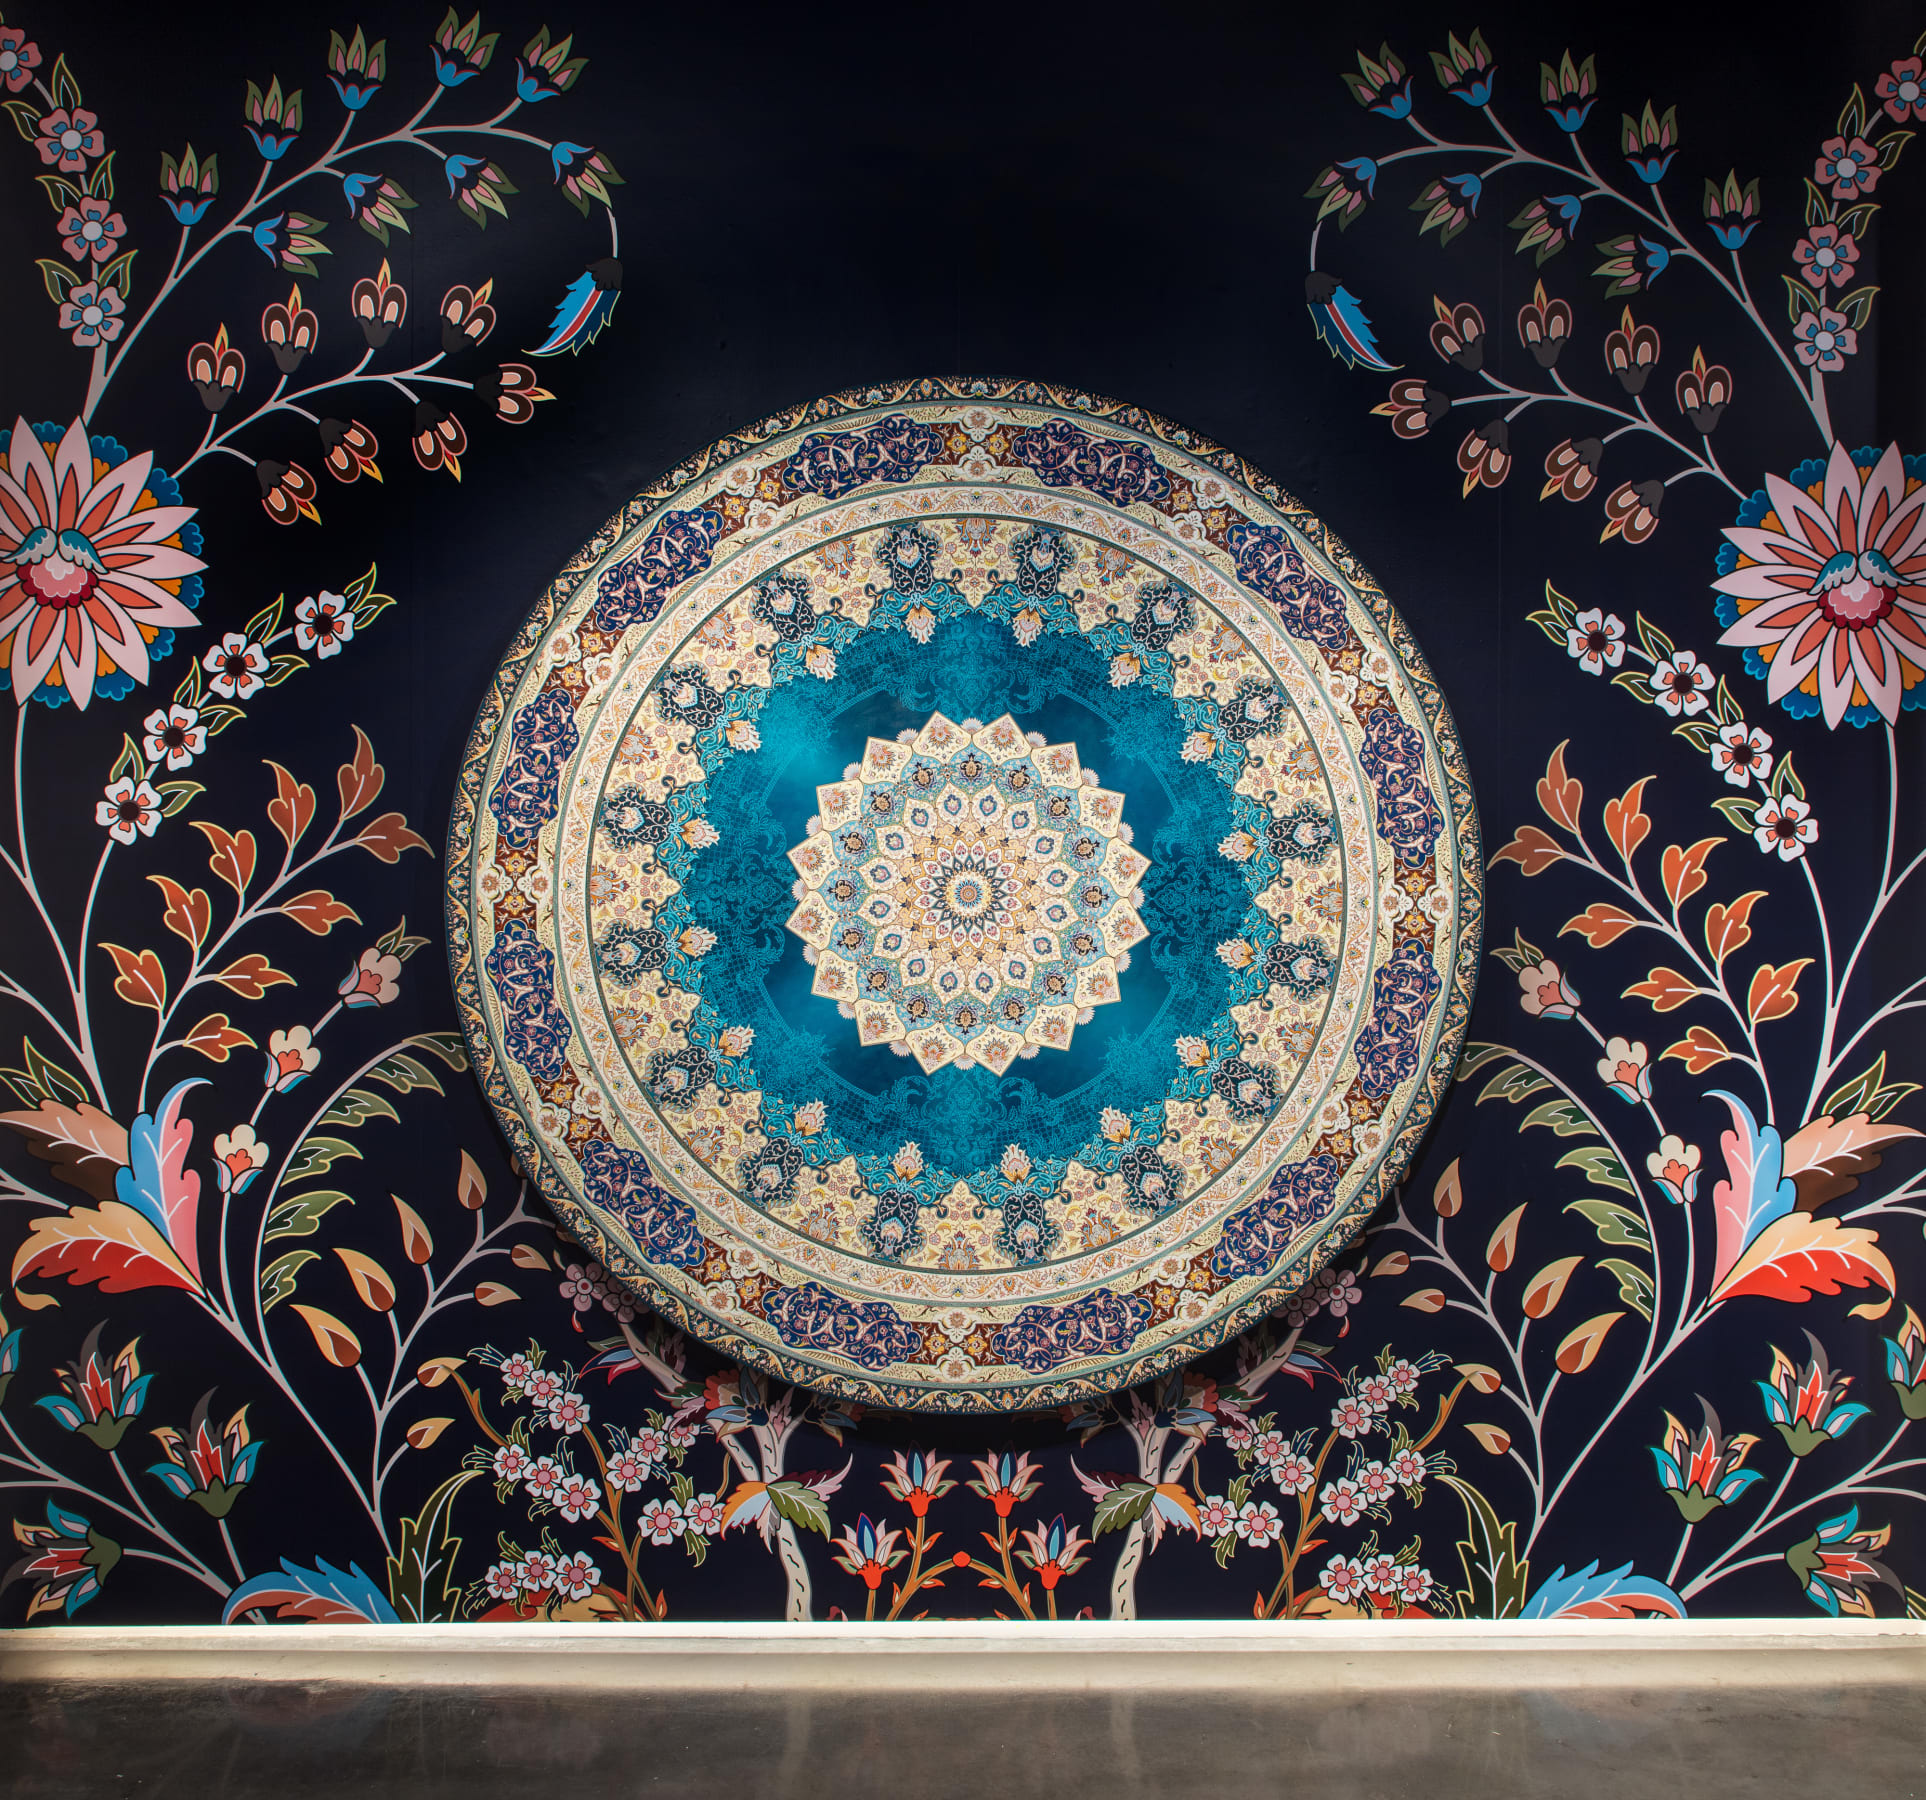 Jason Seife, Van Gogh and Islamic Art